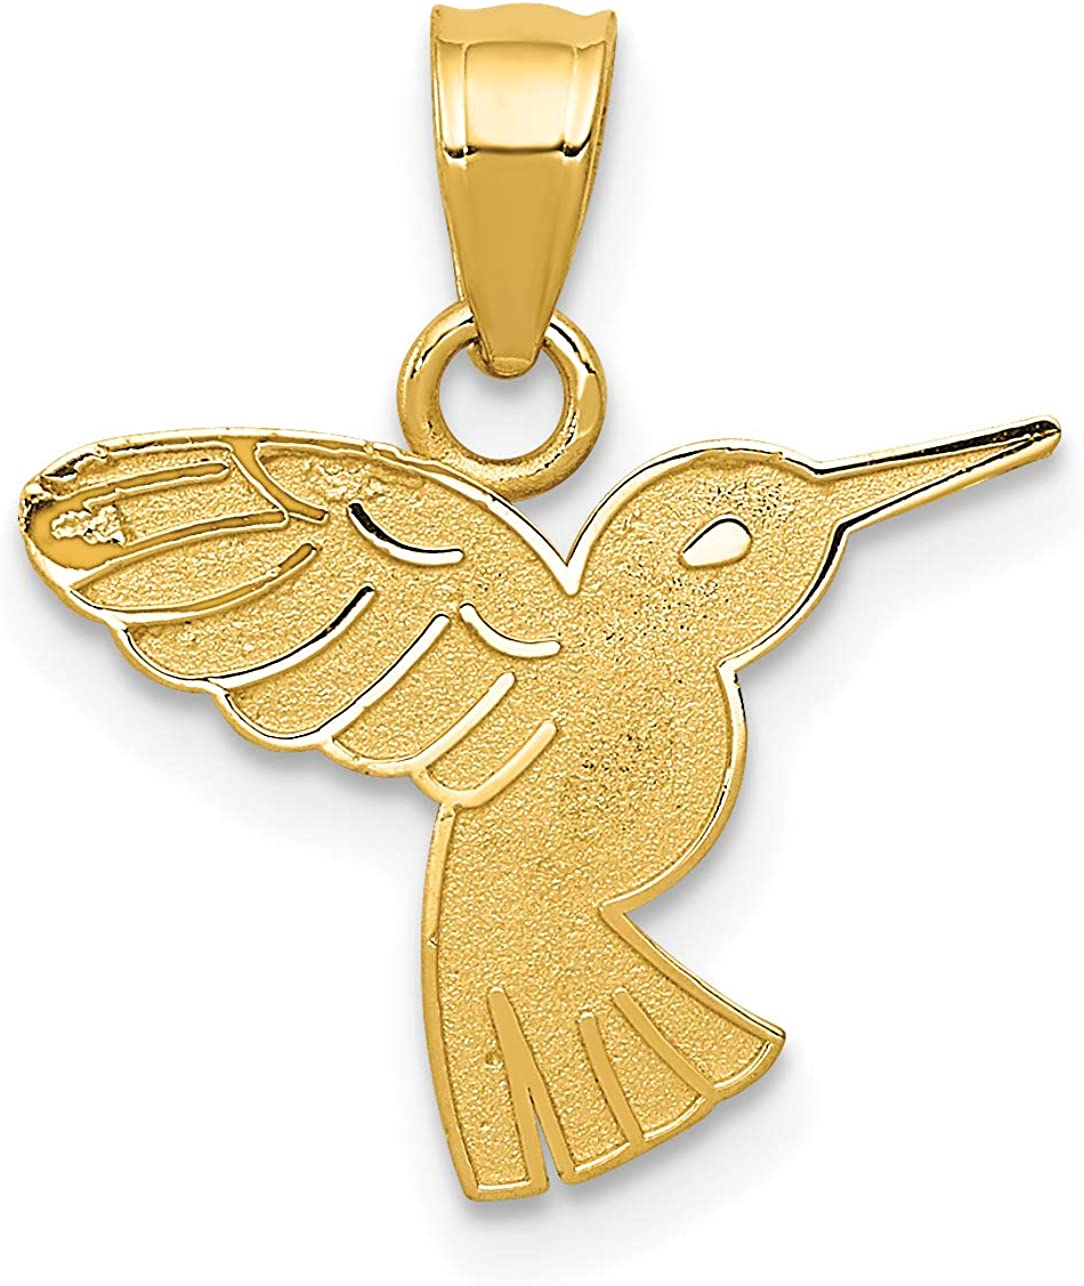 14k Yellow Gold Small Hummingbird Pendant 13x15mm